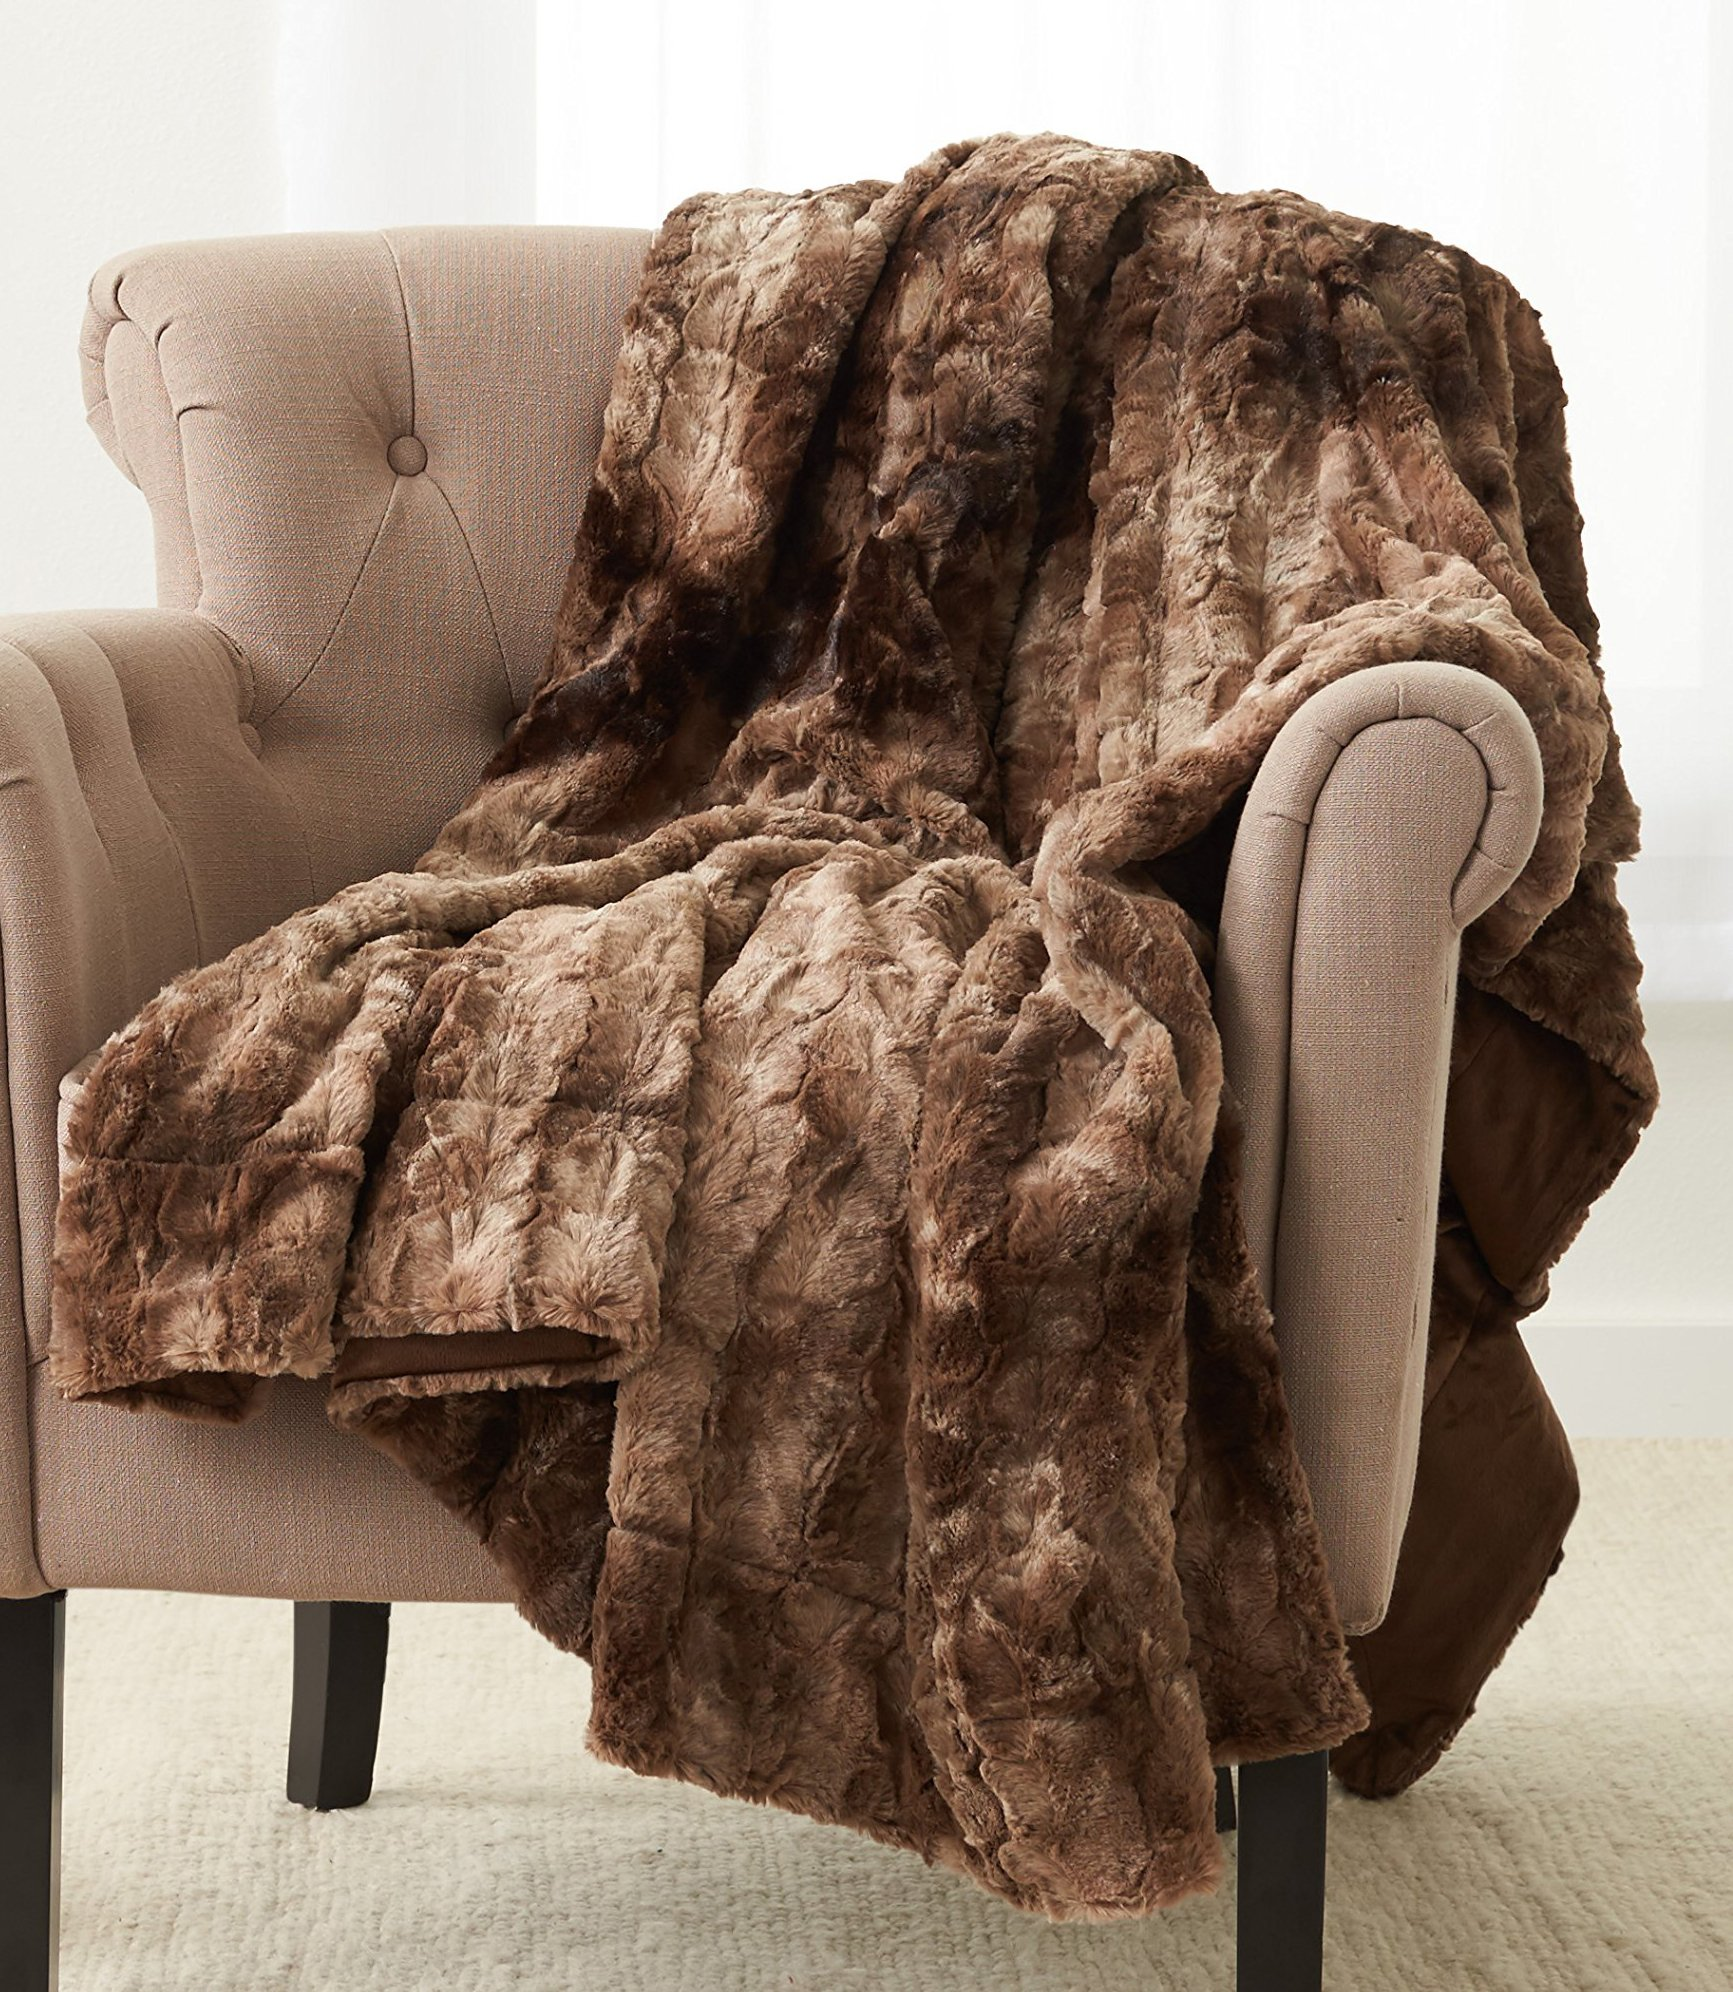 Pinzon Faux Fur Throw Blanket 63'' x 87'', Alpine Brown